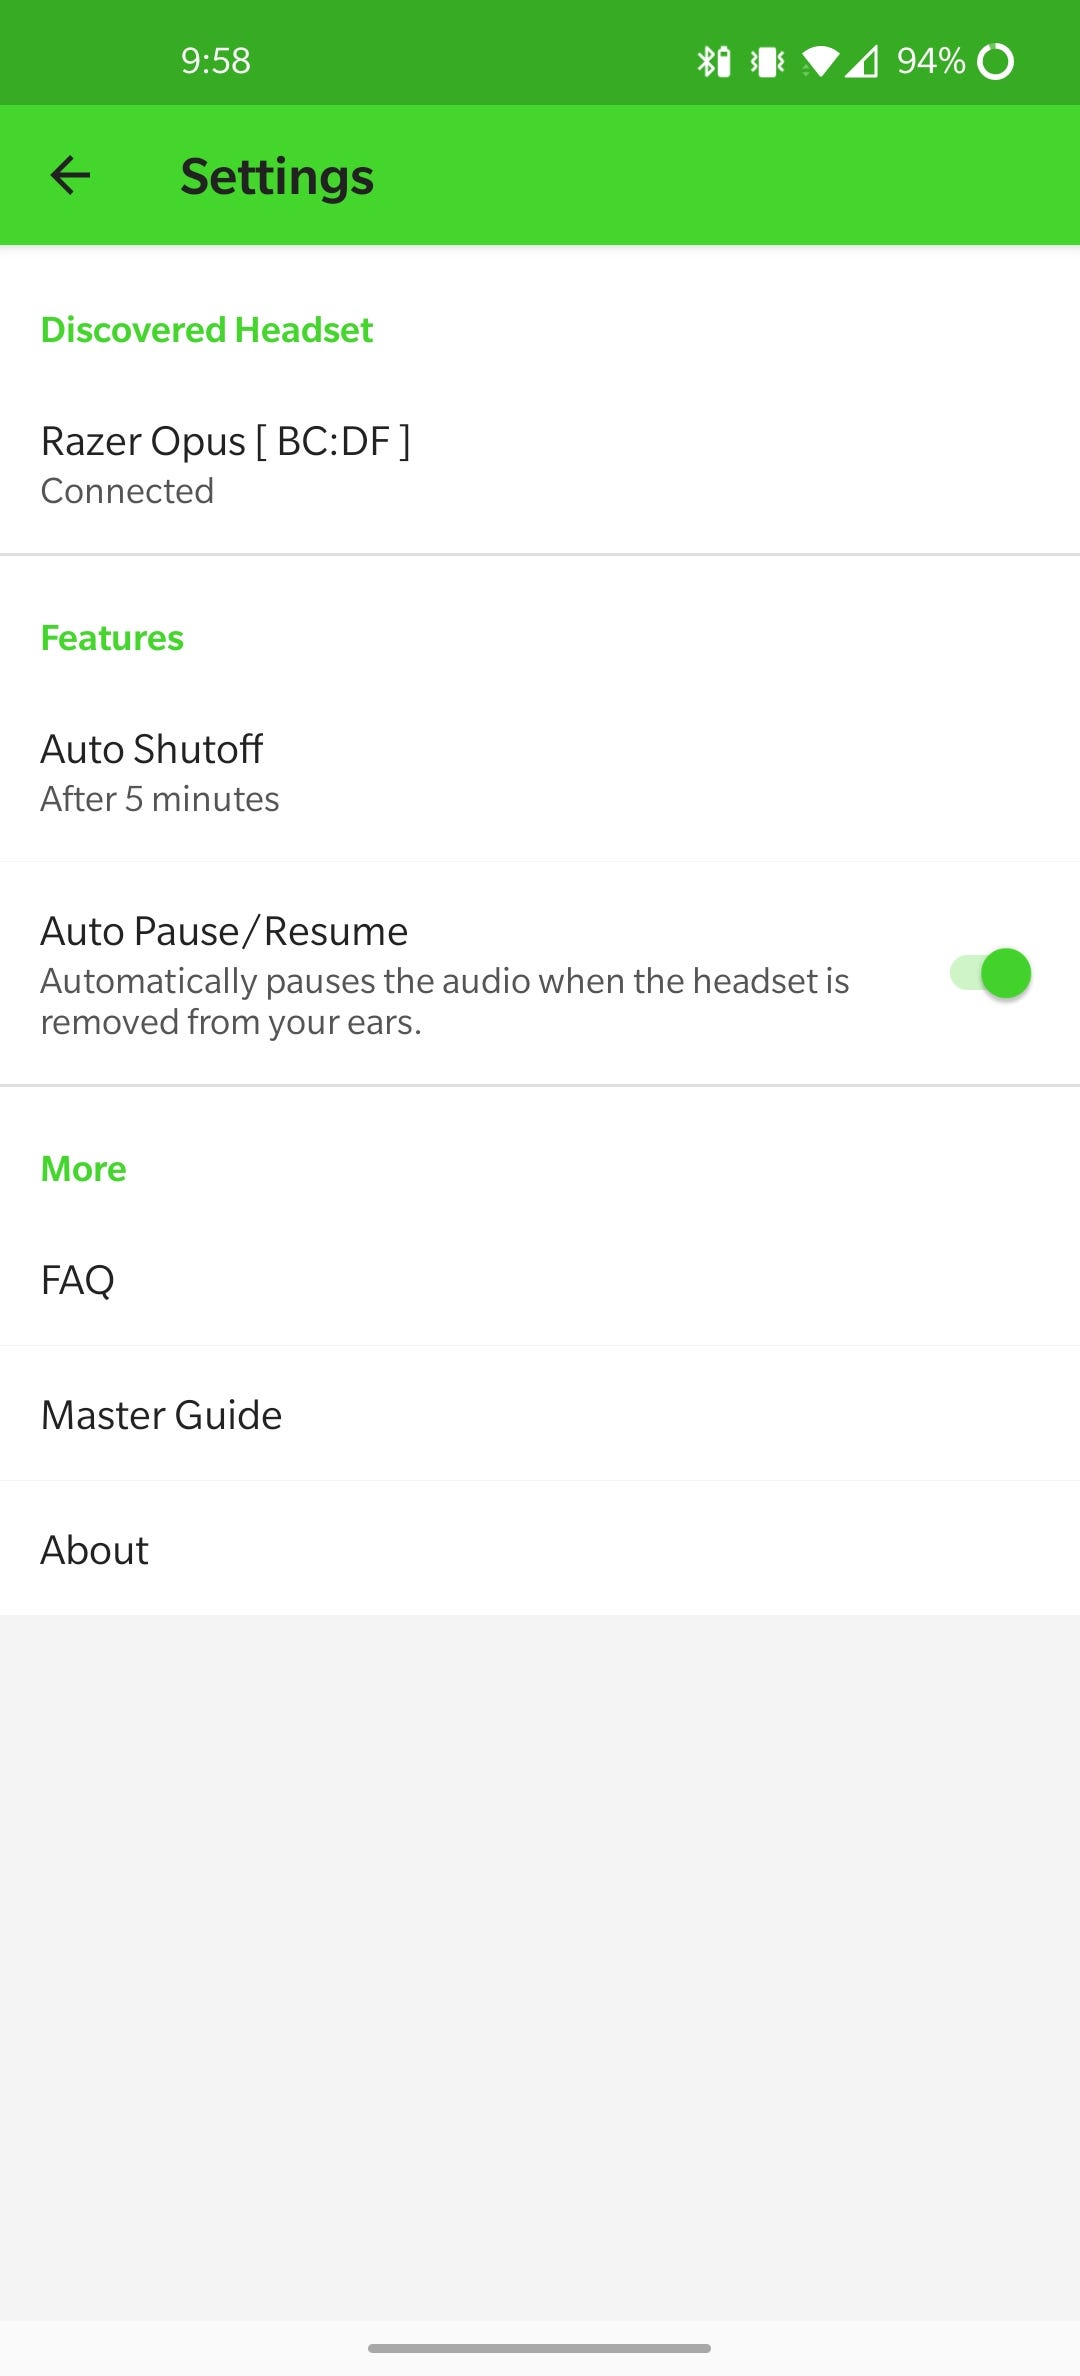 The settings menu in the Opus app